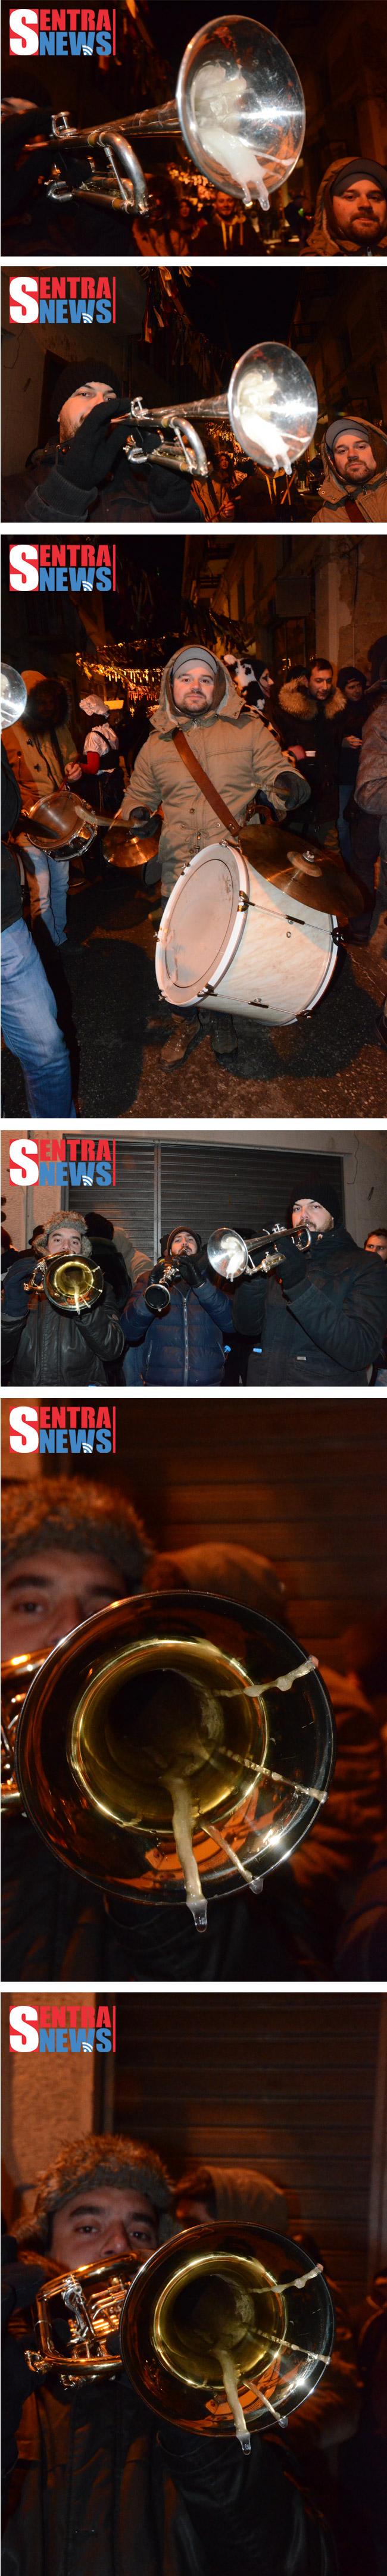 pagomenes trompetes ragoutsaria